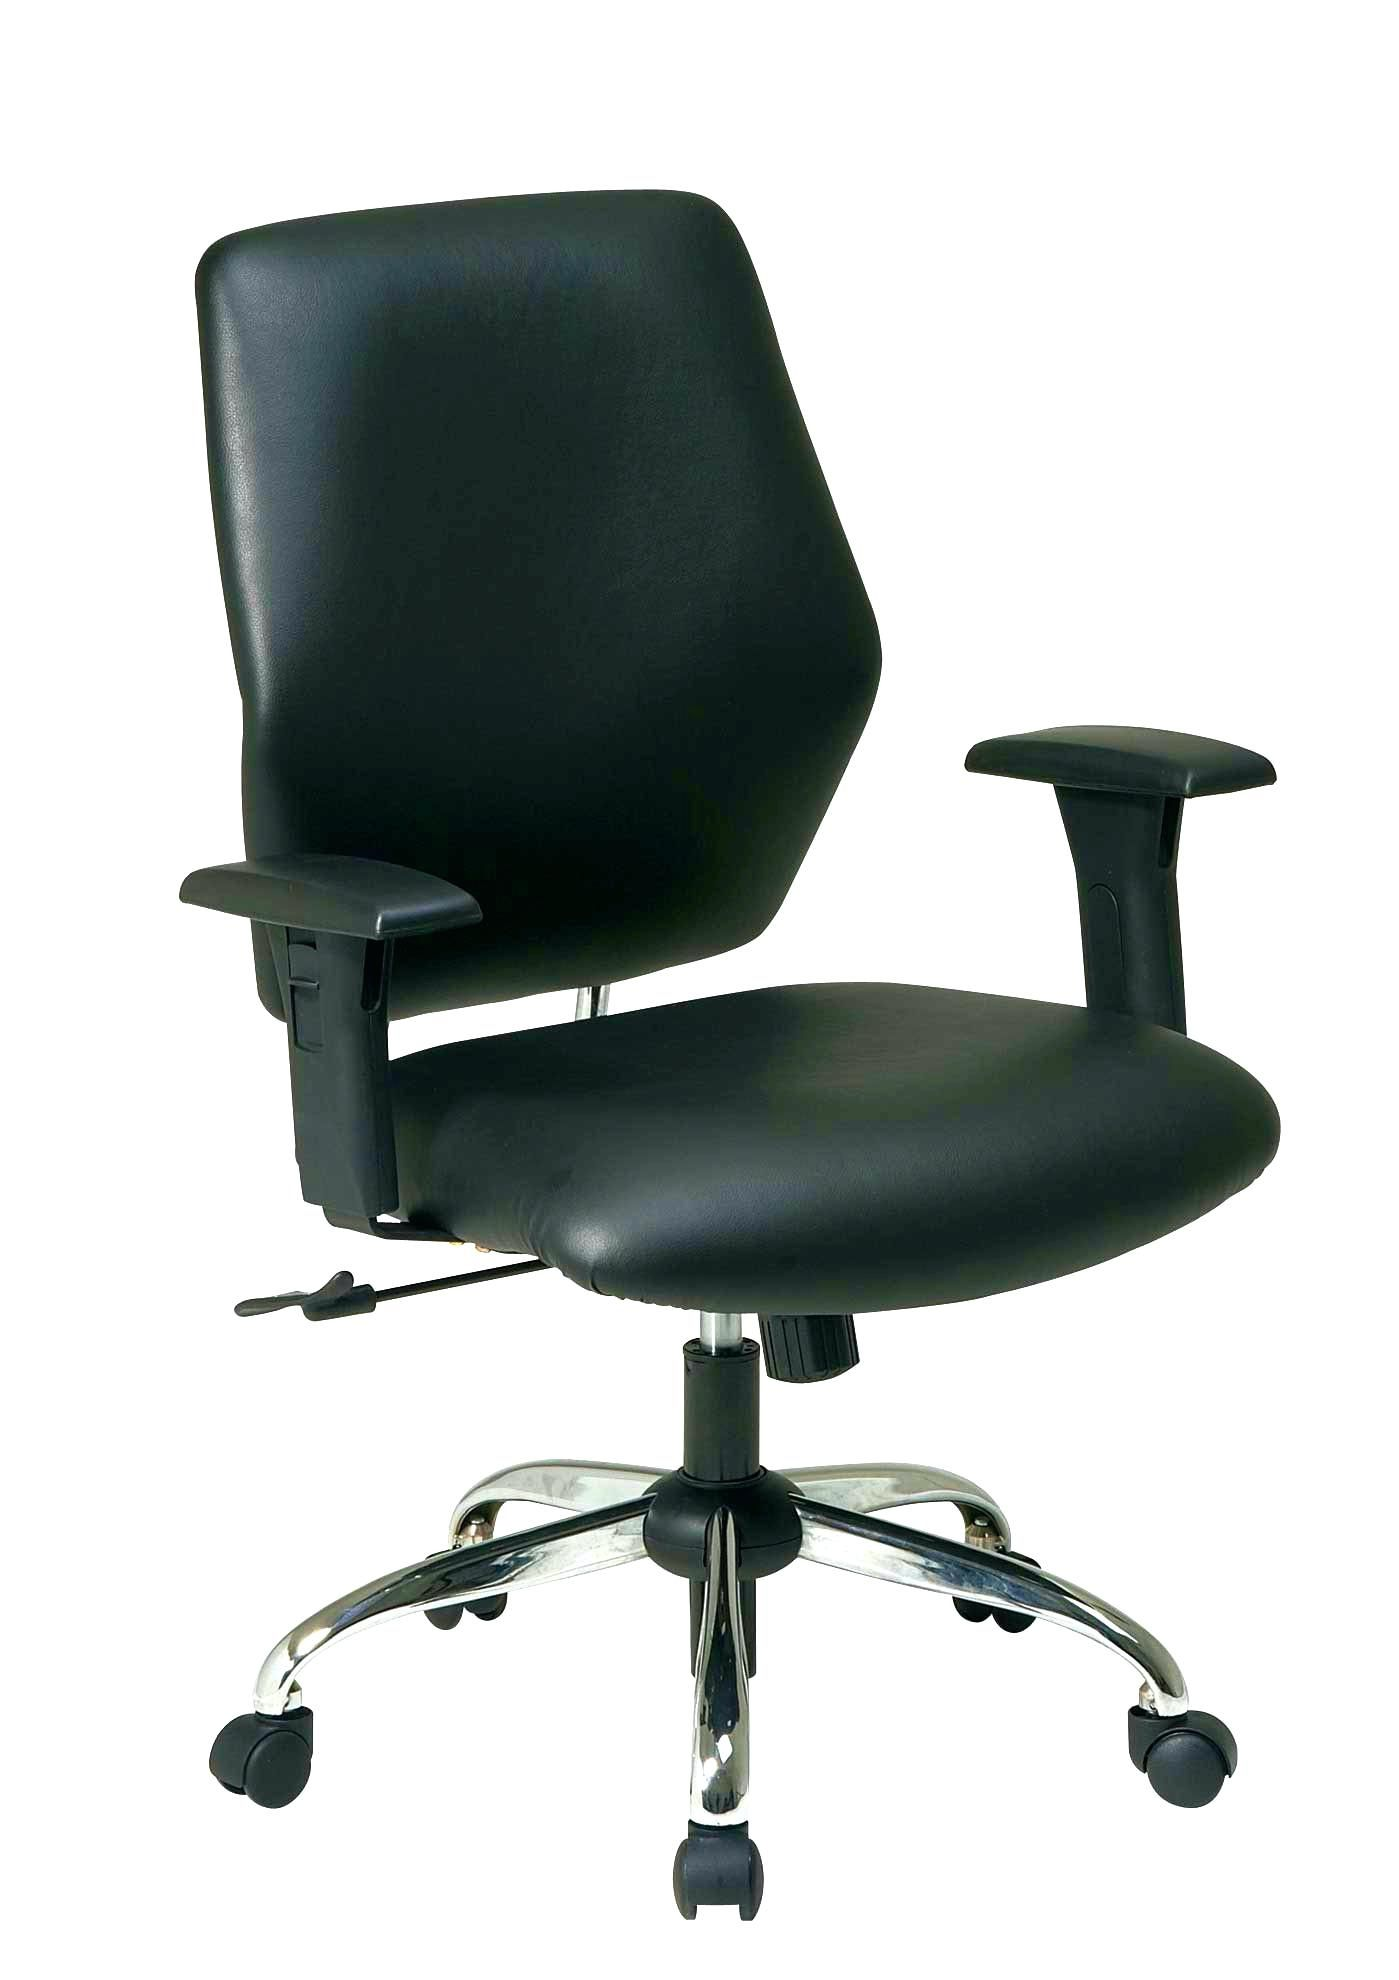 Custom Fabric Desk Chairs